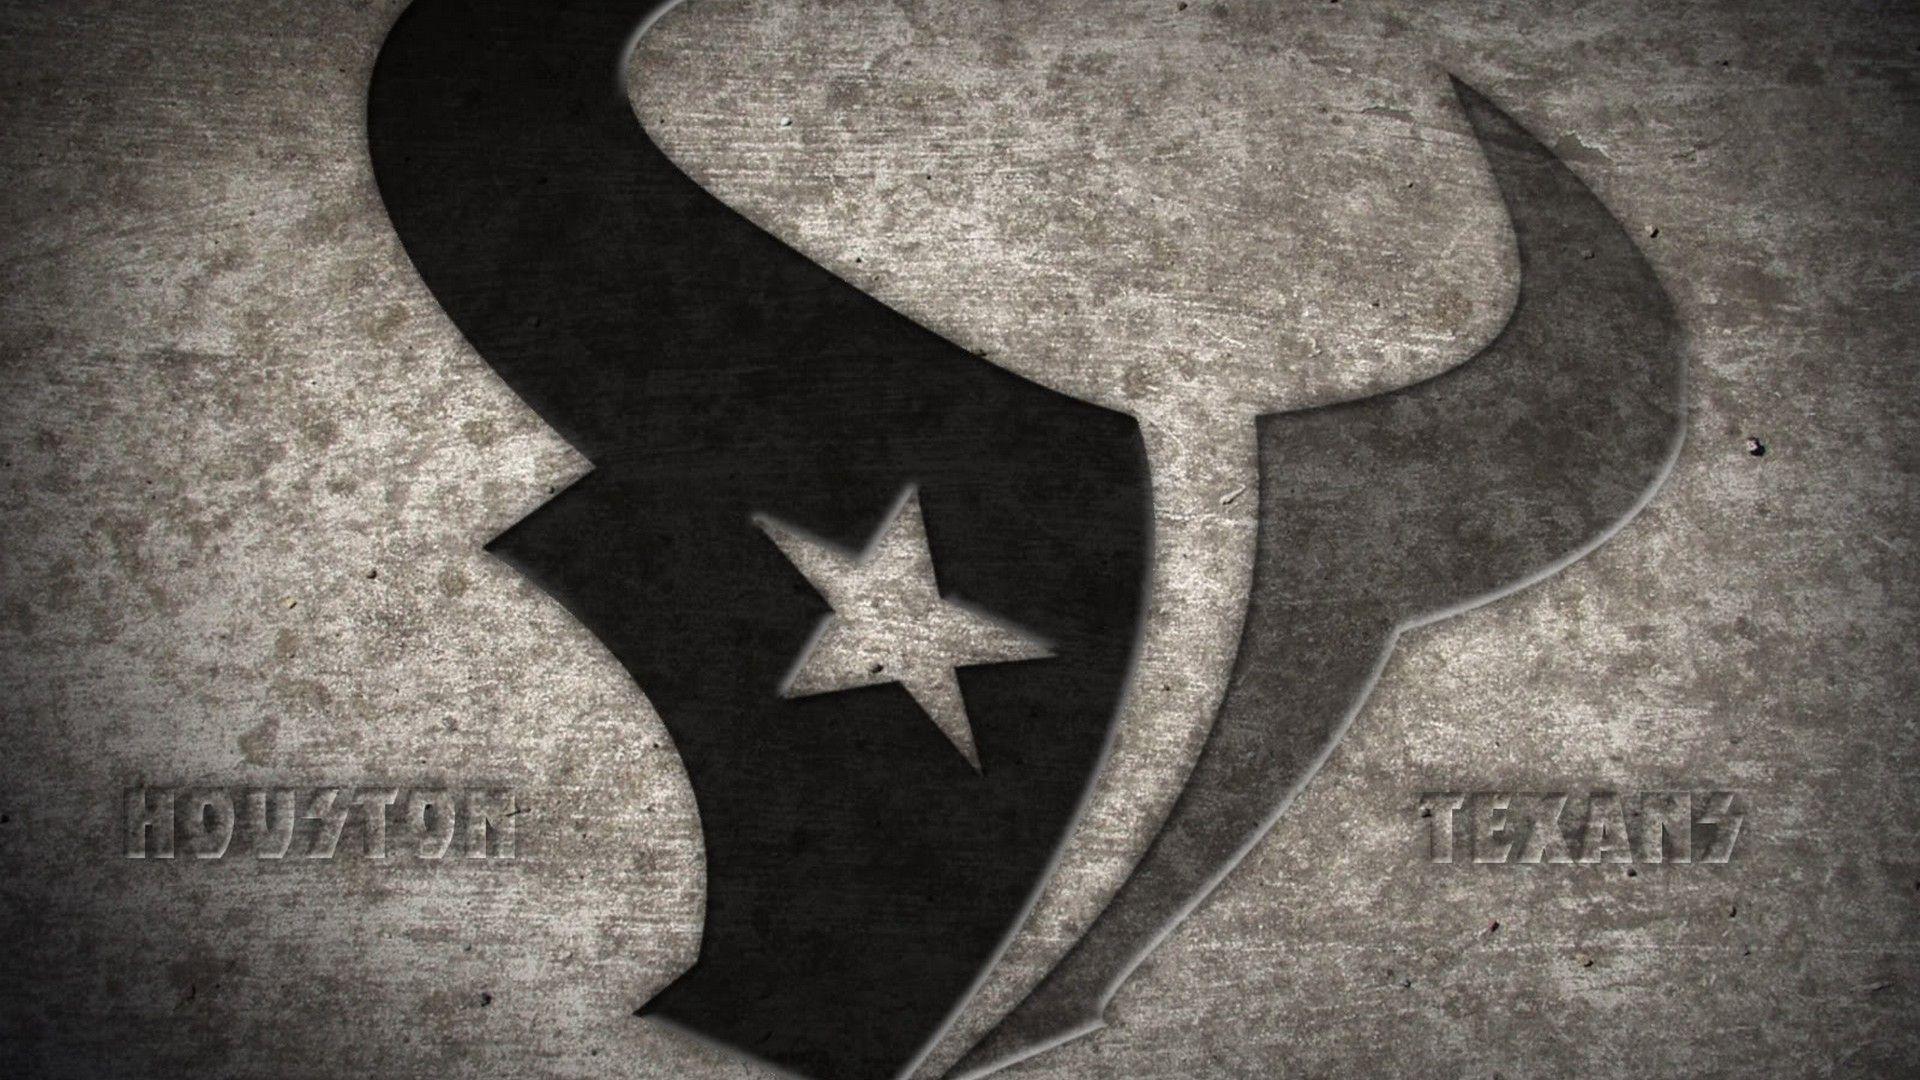 Houston Texans laptop wallpaper